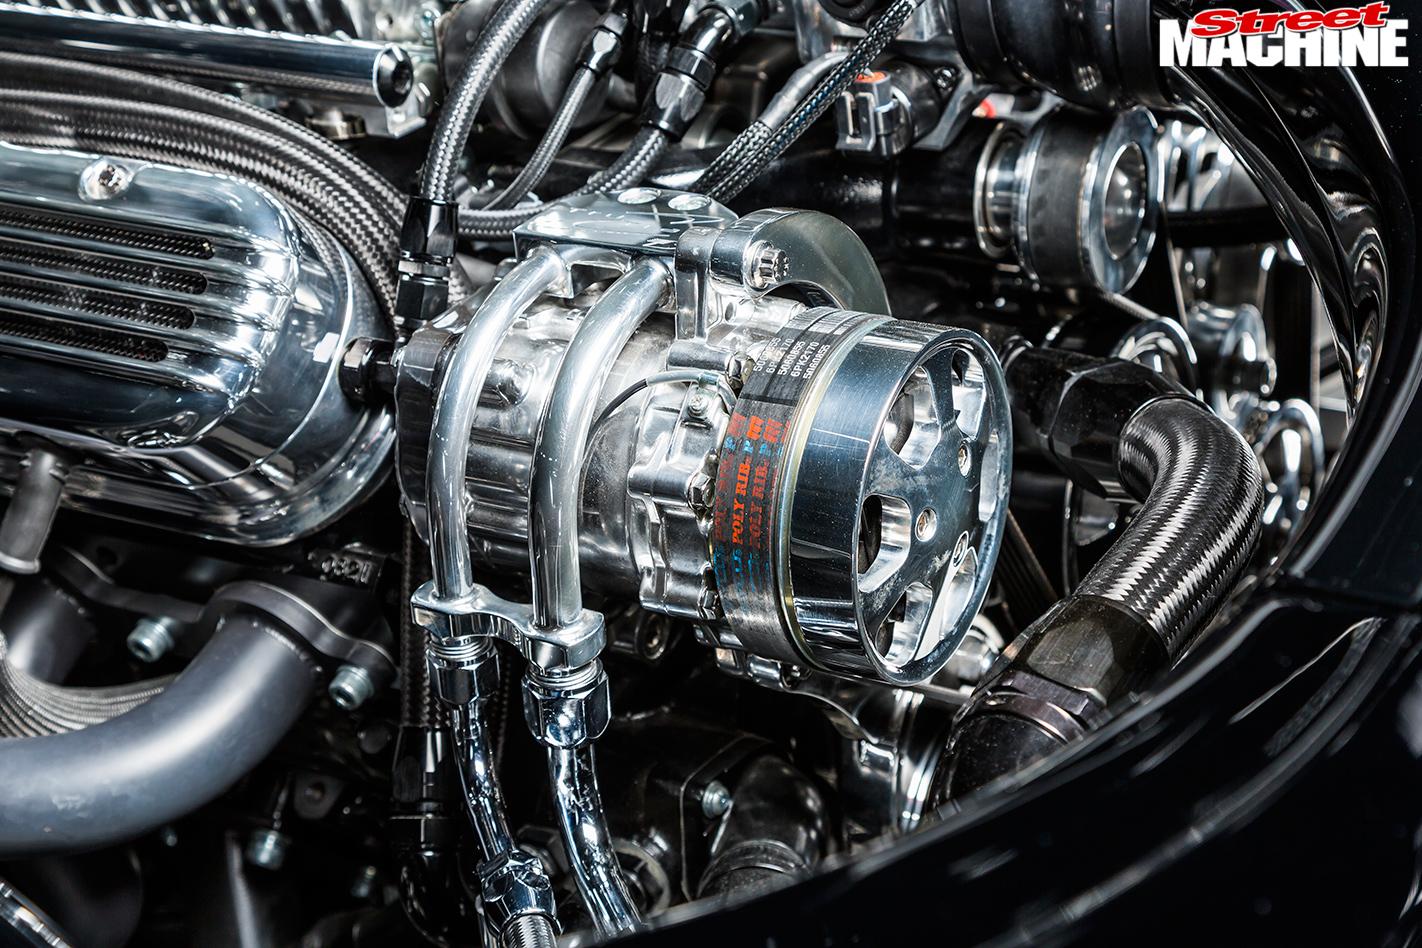 Pontiac -Laurentian -engine -detail